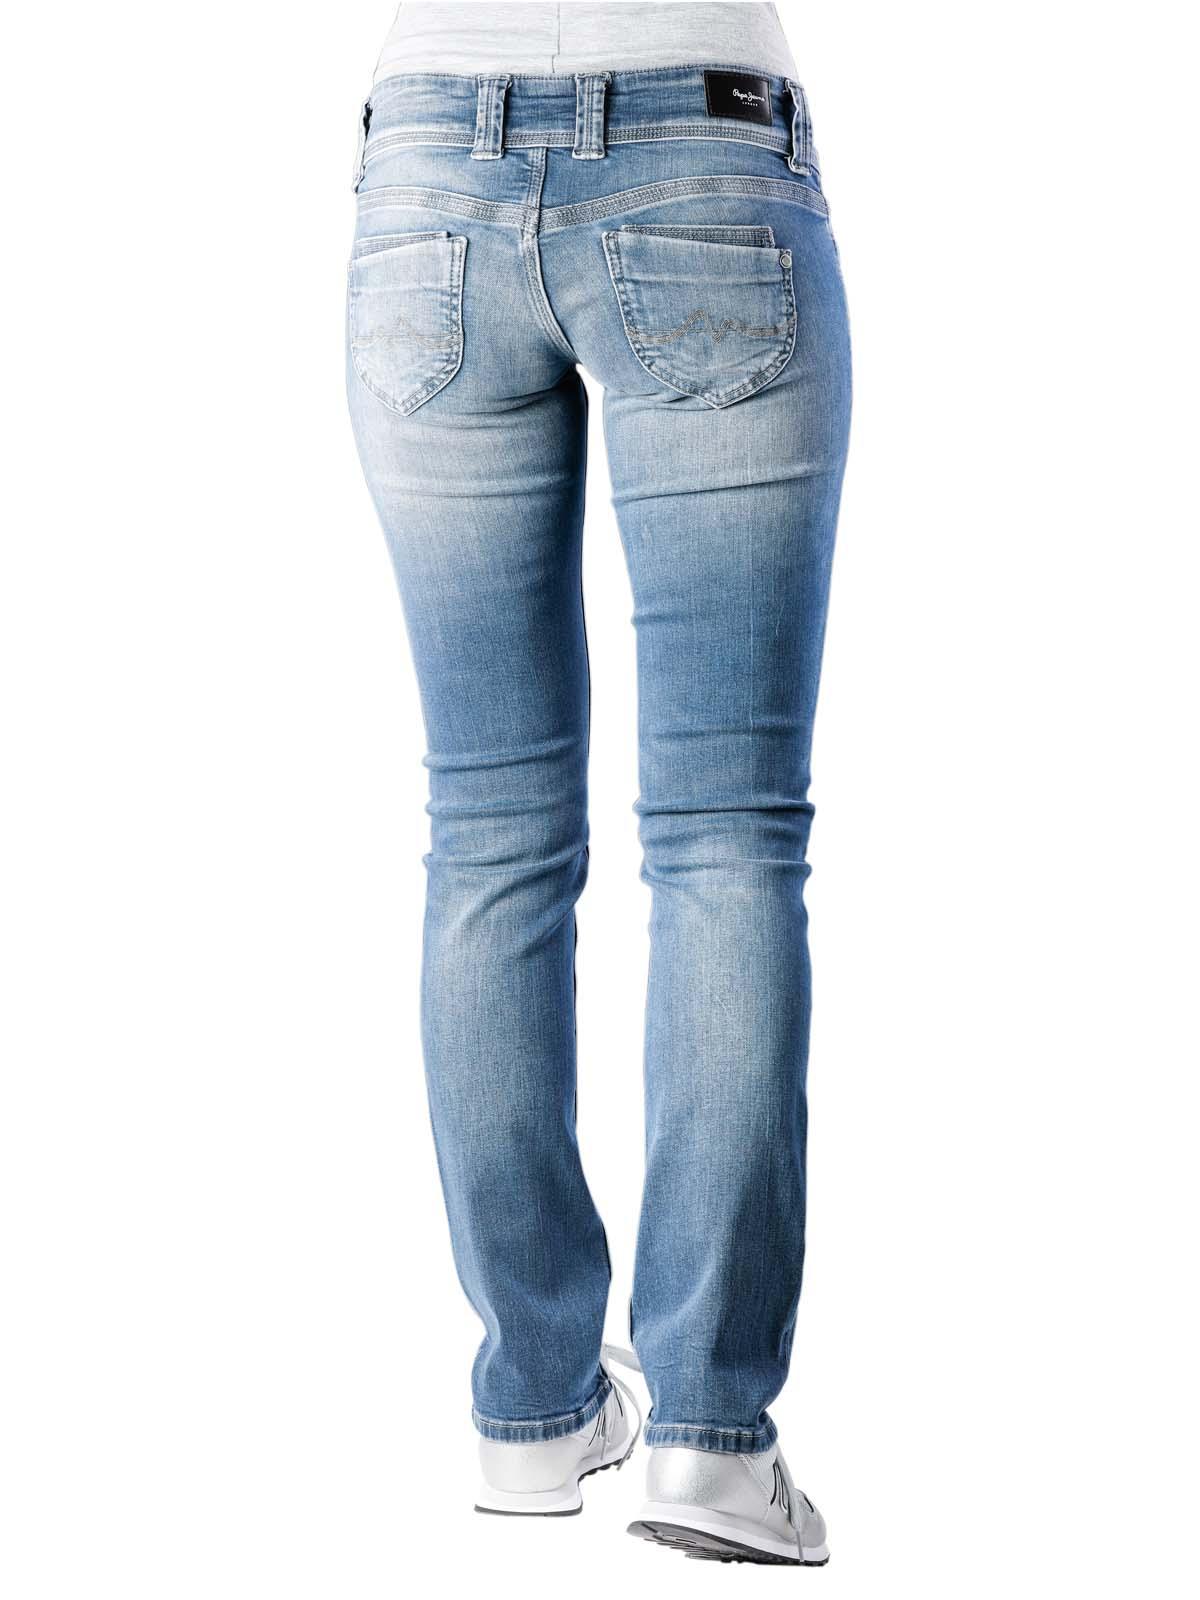 Pepe Jeans Venus Straight WE6 Pepe Jeans Women's Jeans